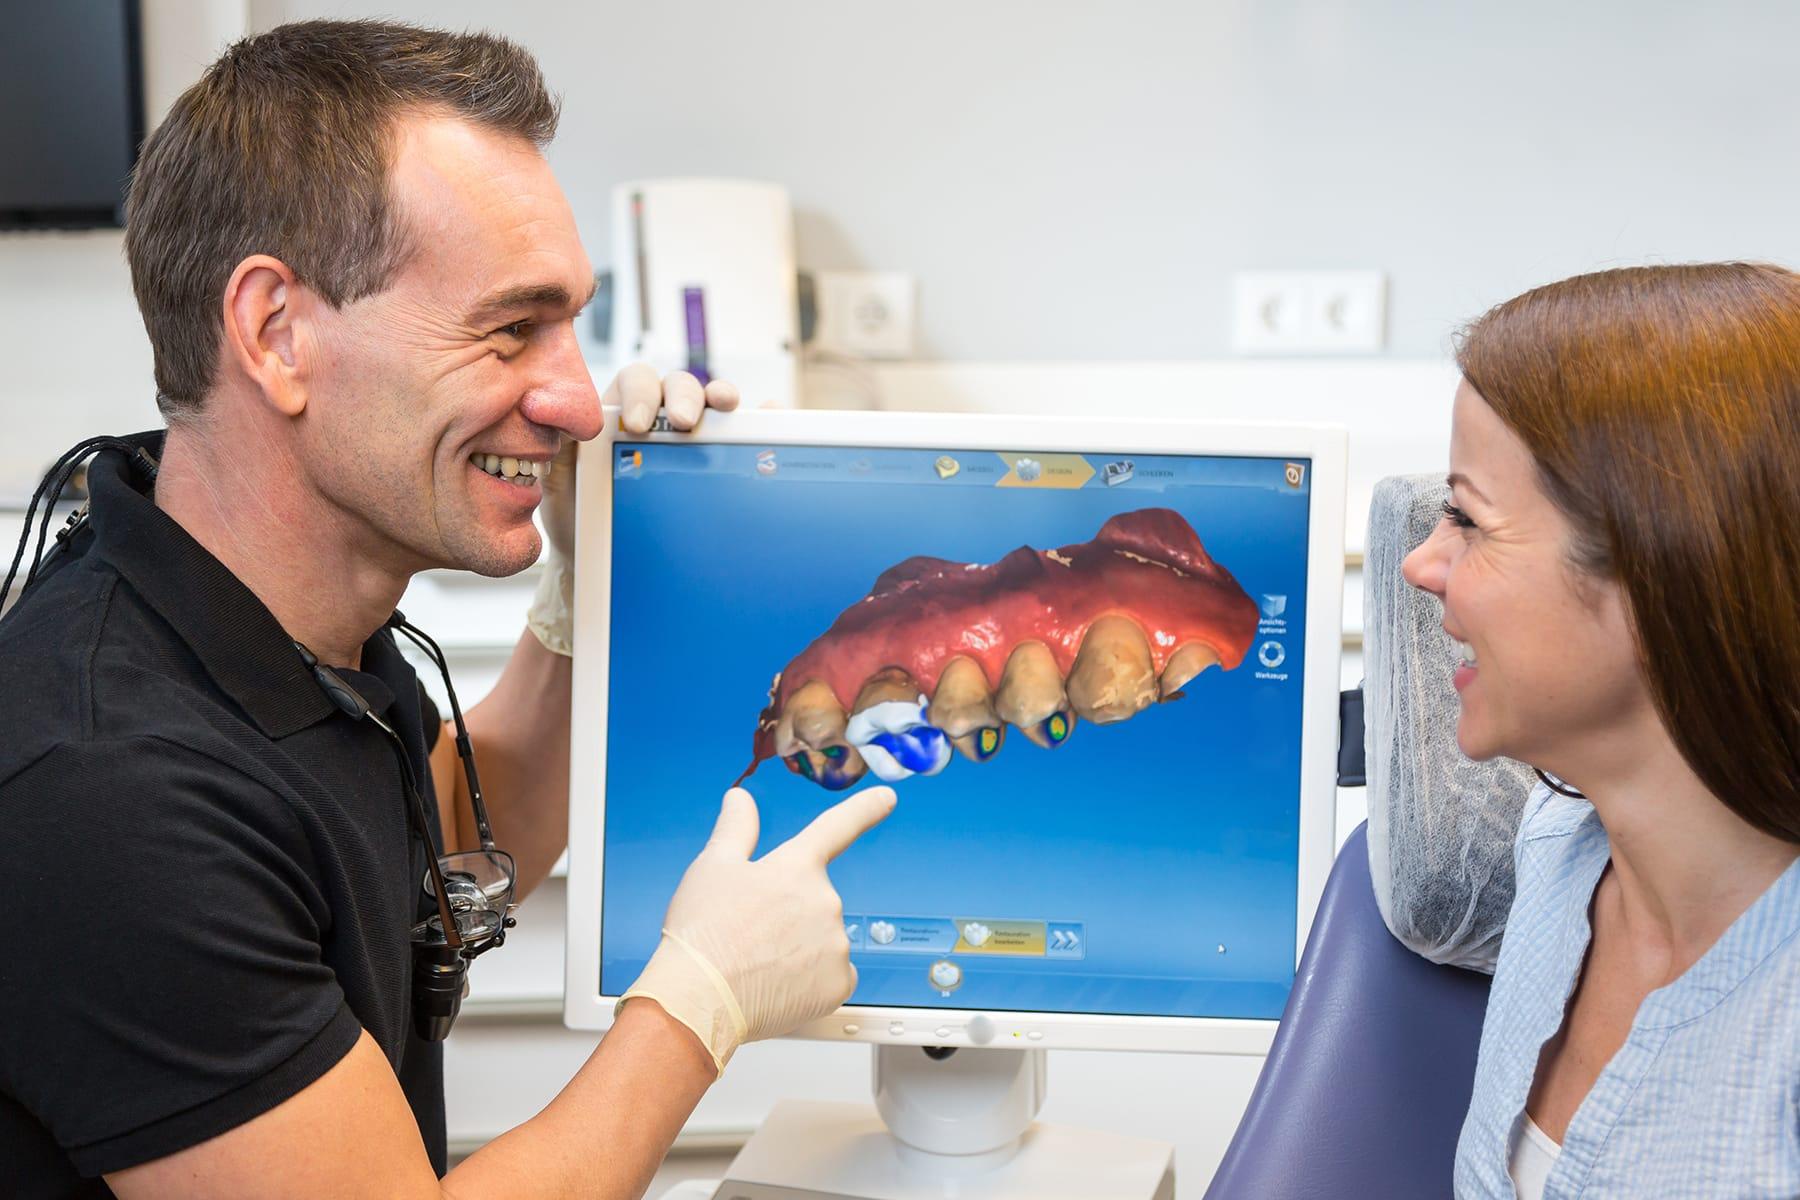 mini implant cost